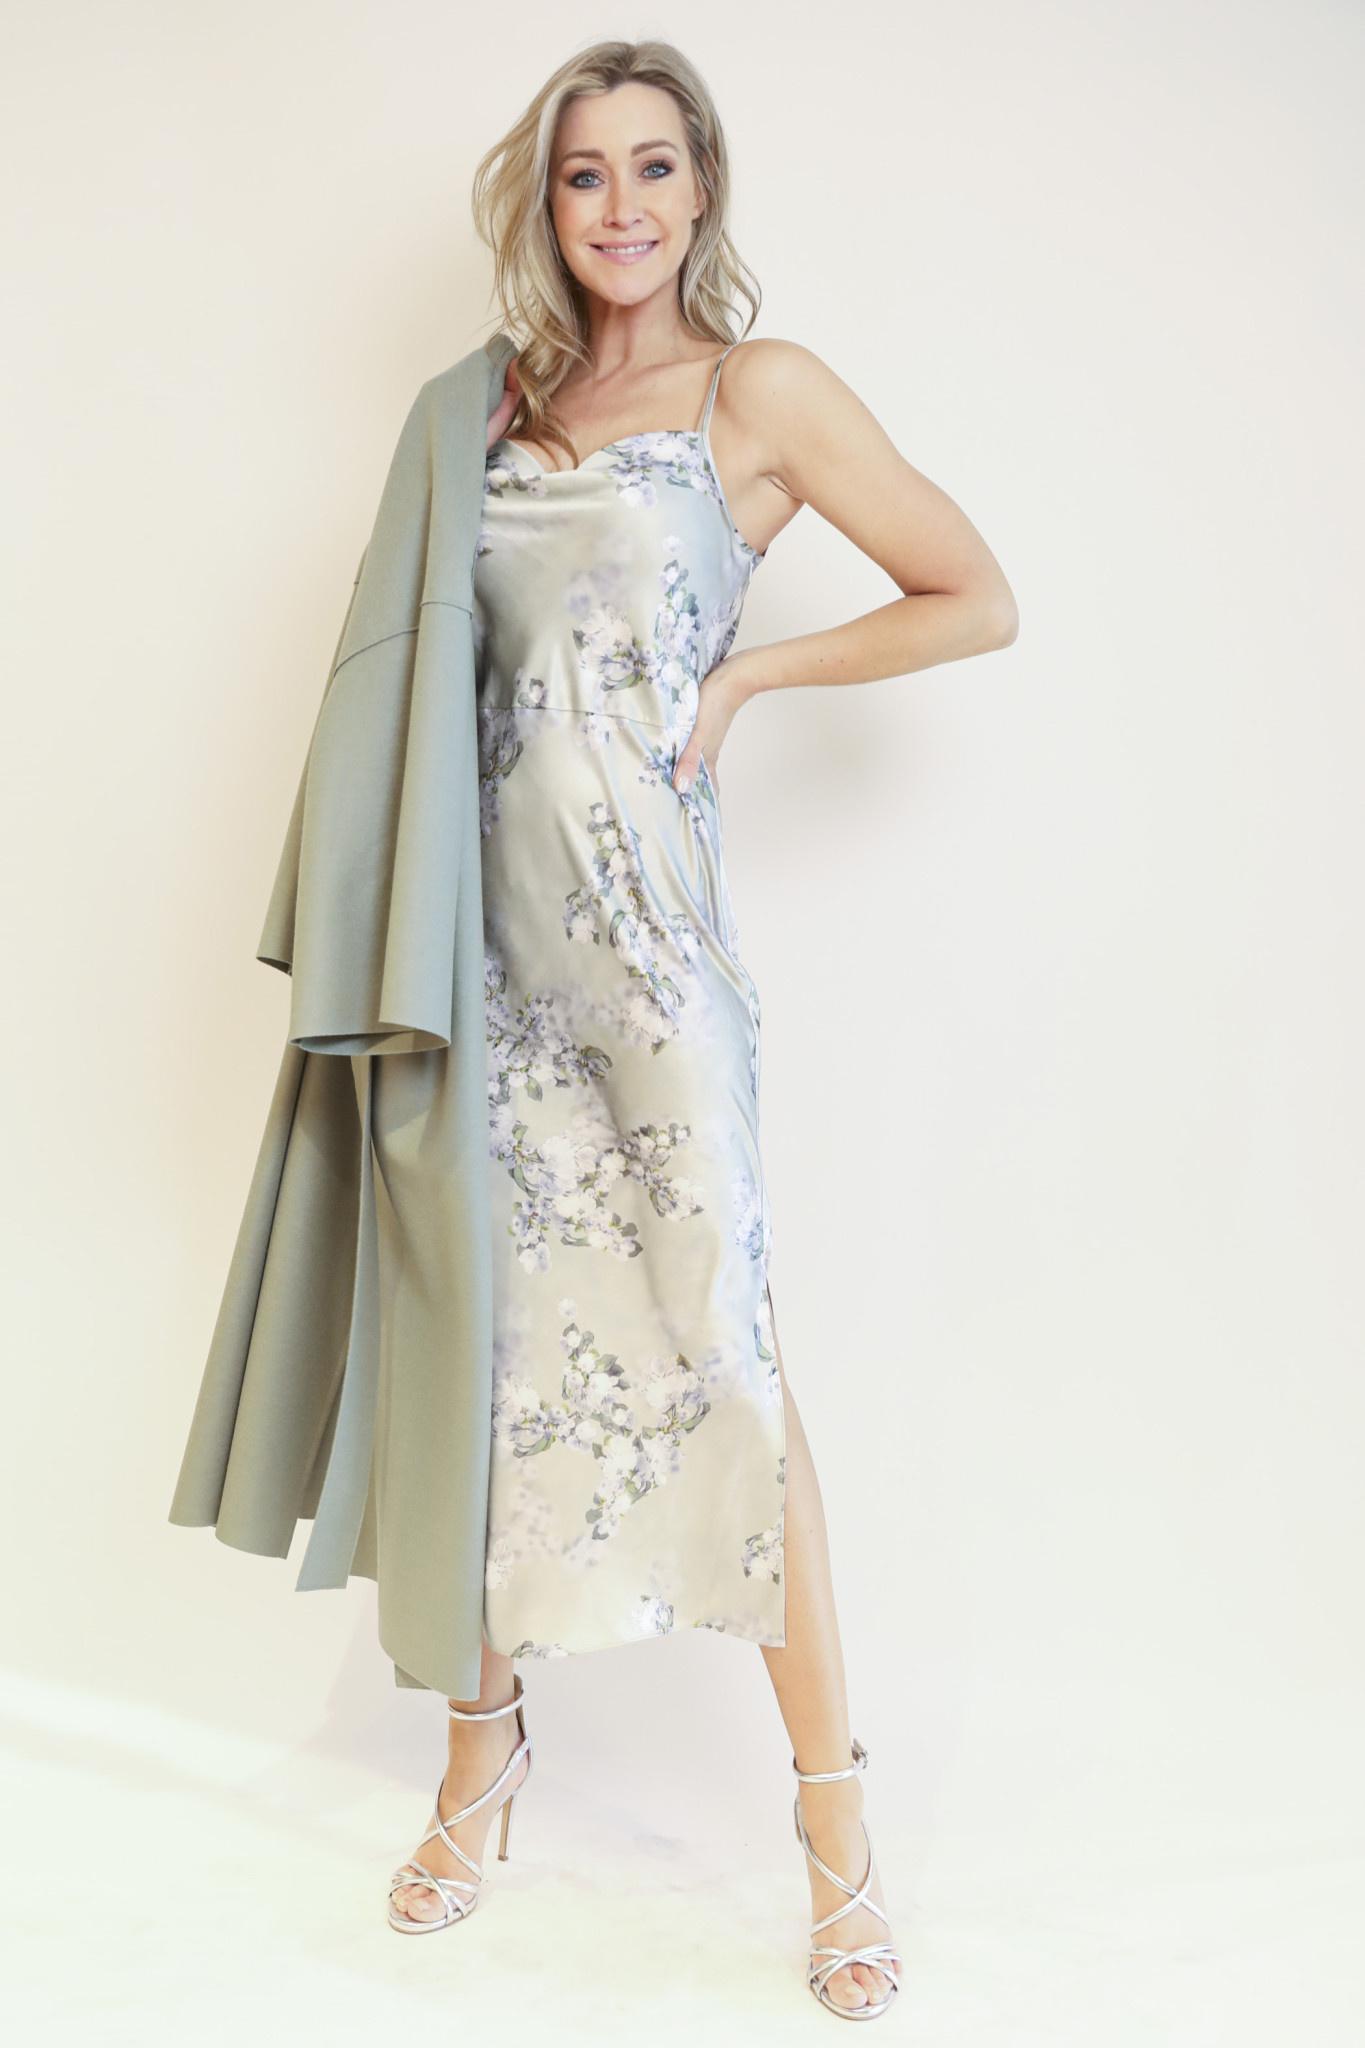 Hazy blossom cowl nk slip dress-1